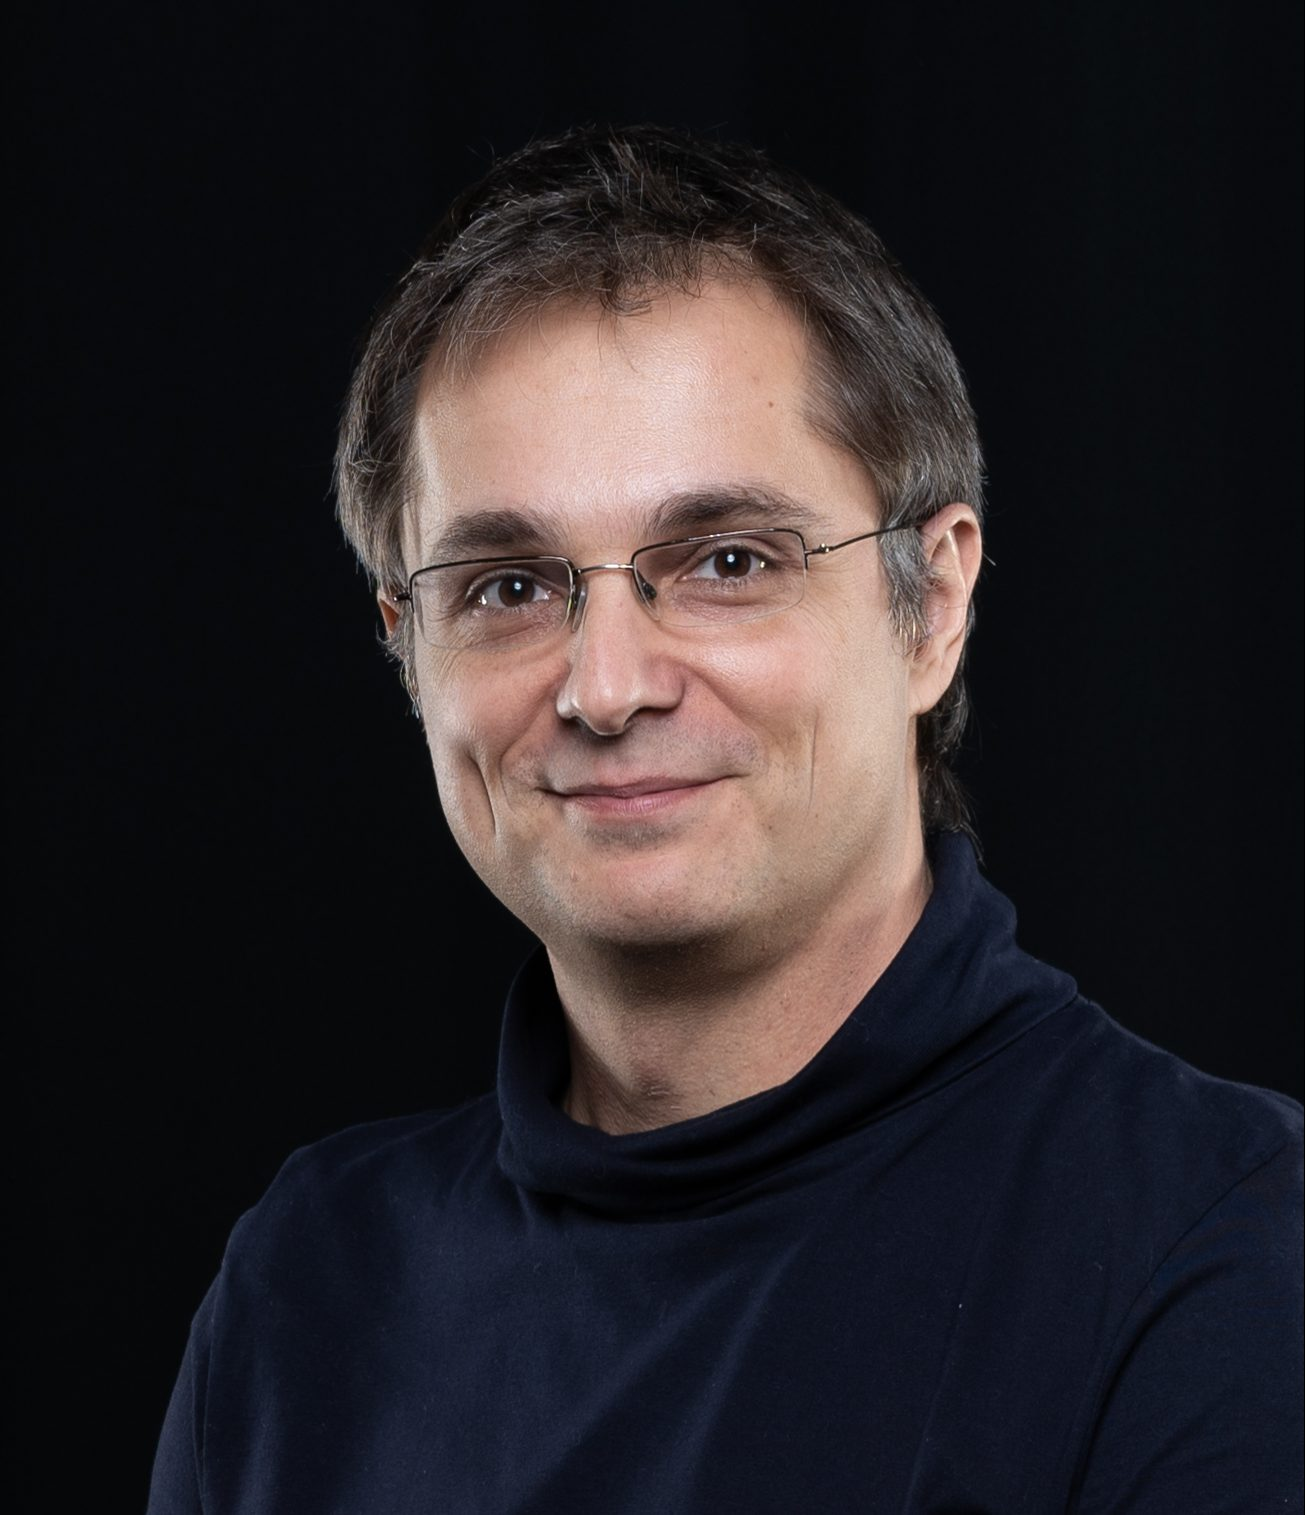 Peter Harum